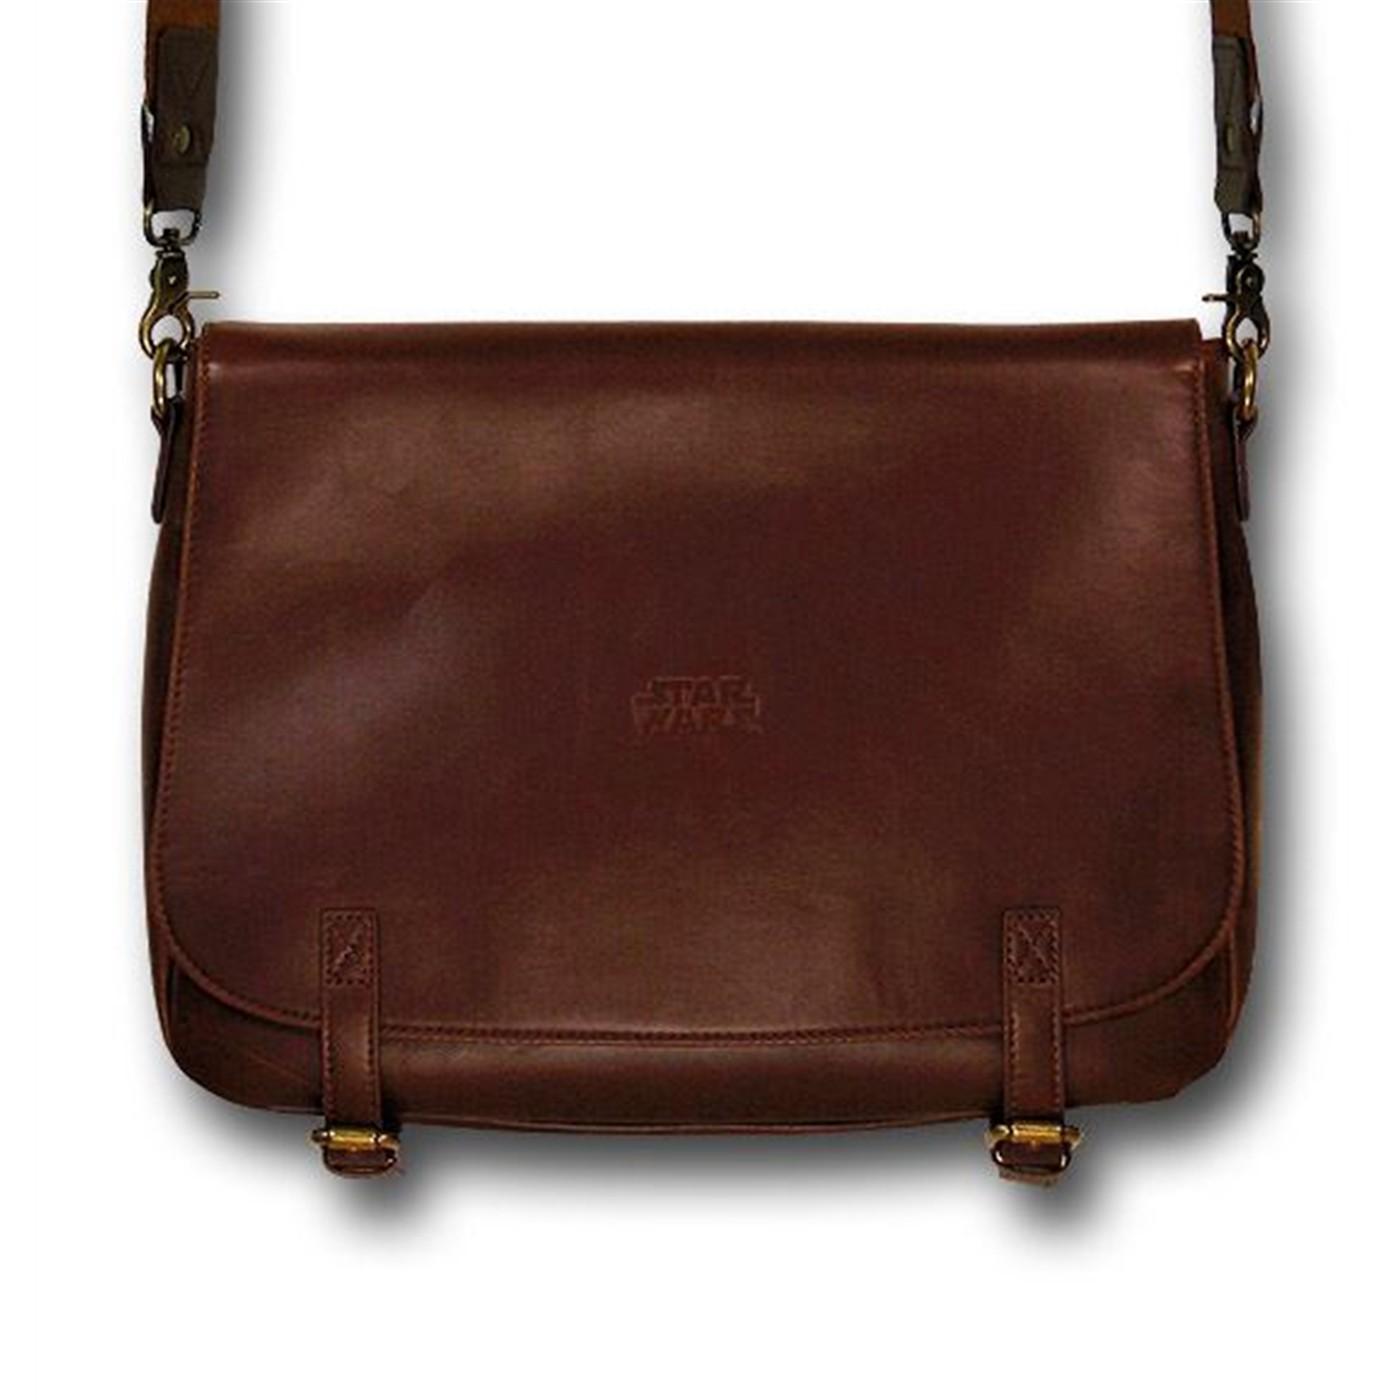 Star Wars Chewbacca Messenger Bag